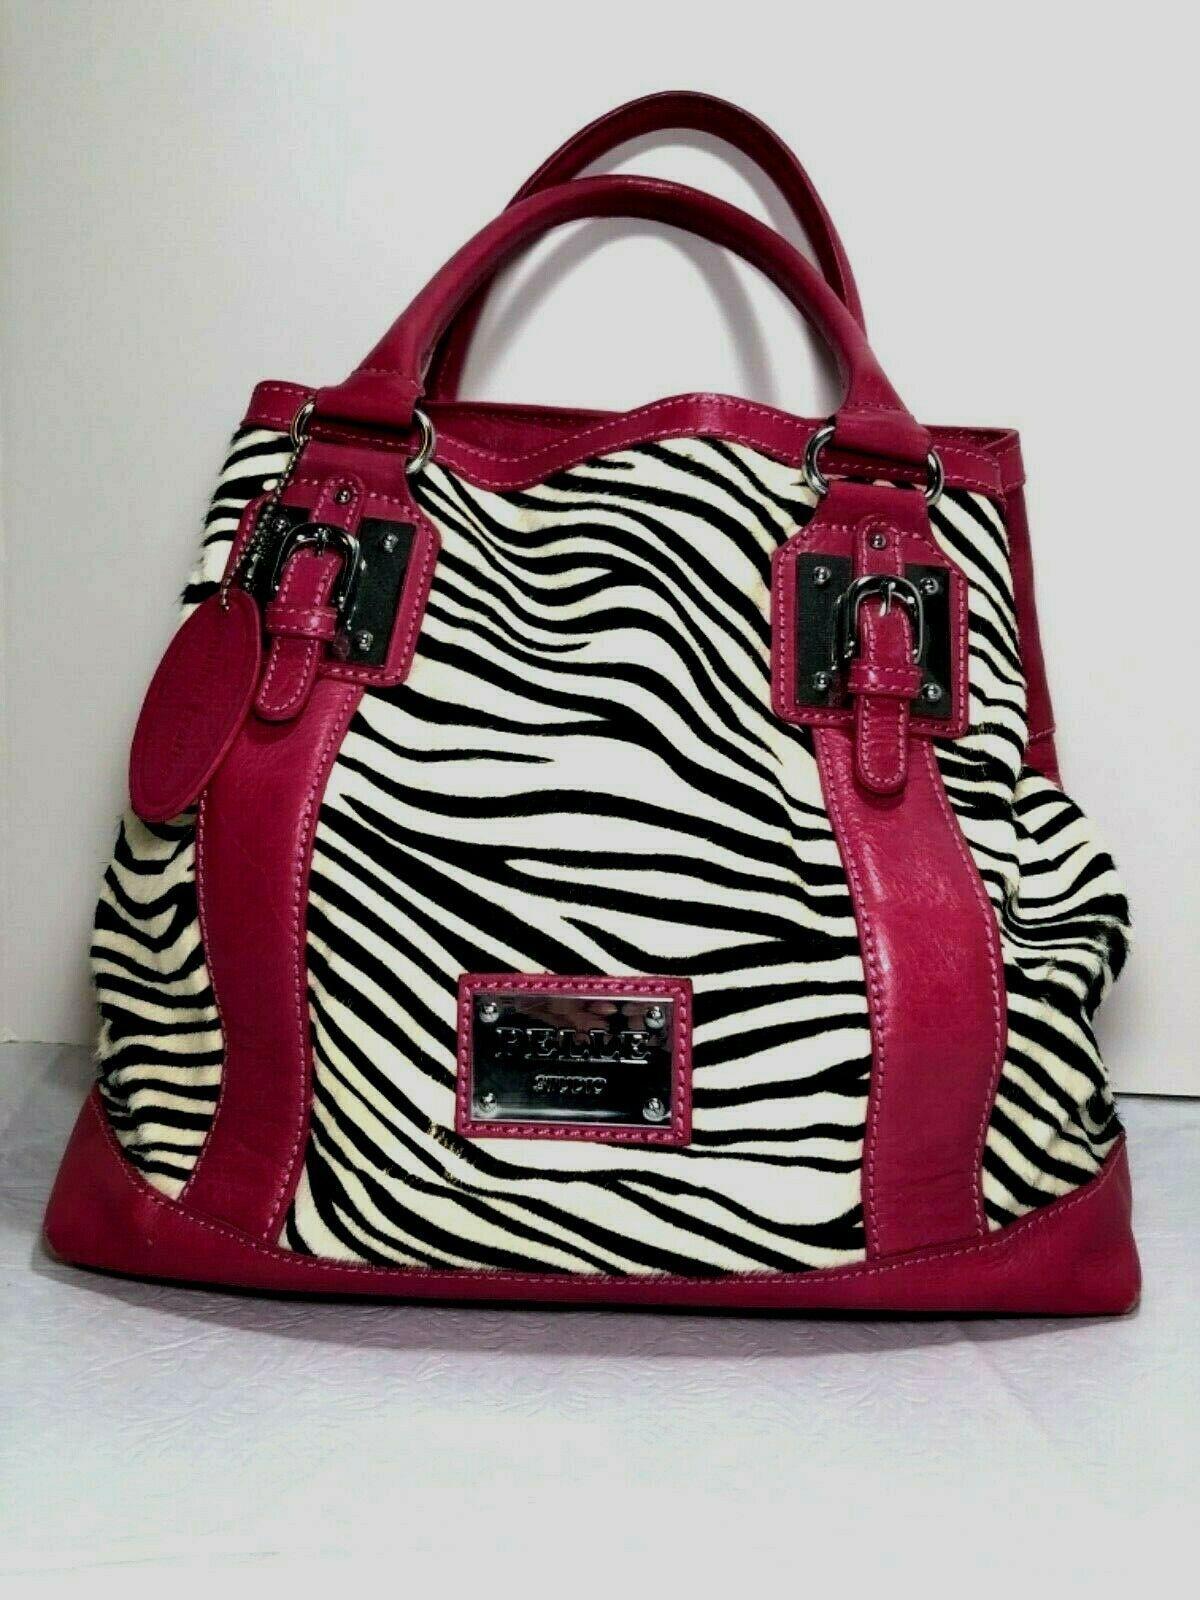 Wilson's Leather Pelle Studio Pink Leather Zebra Print